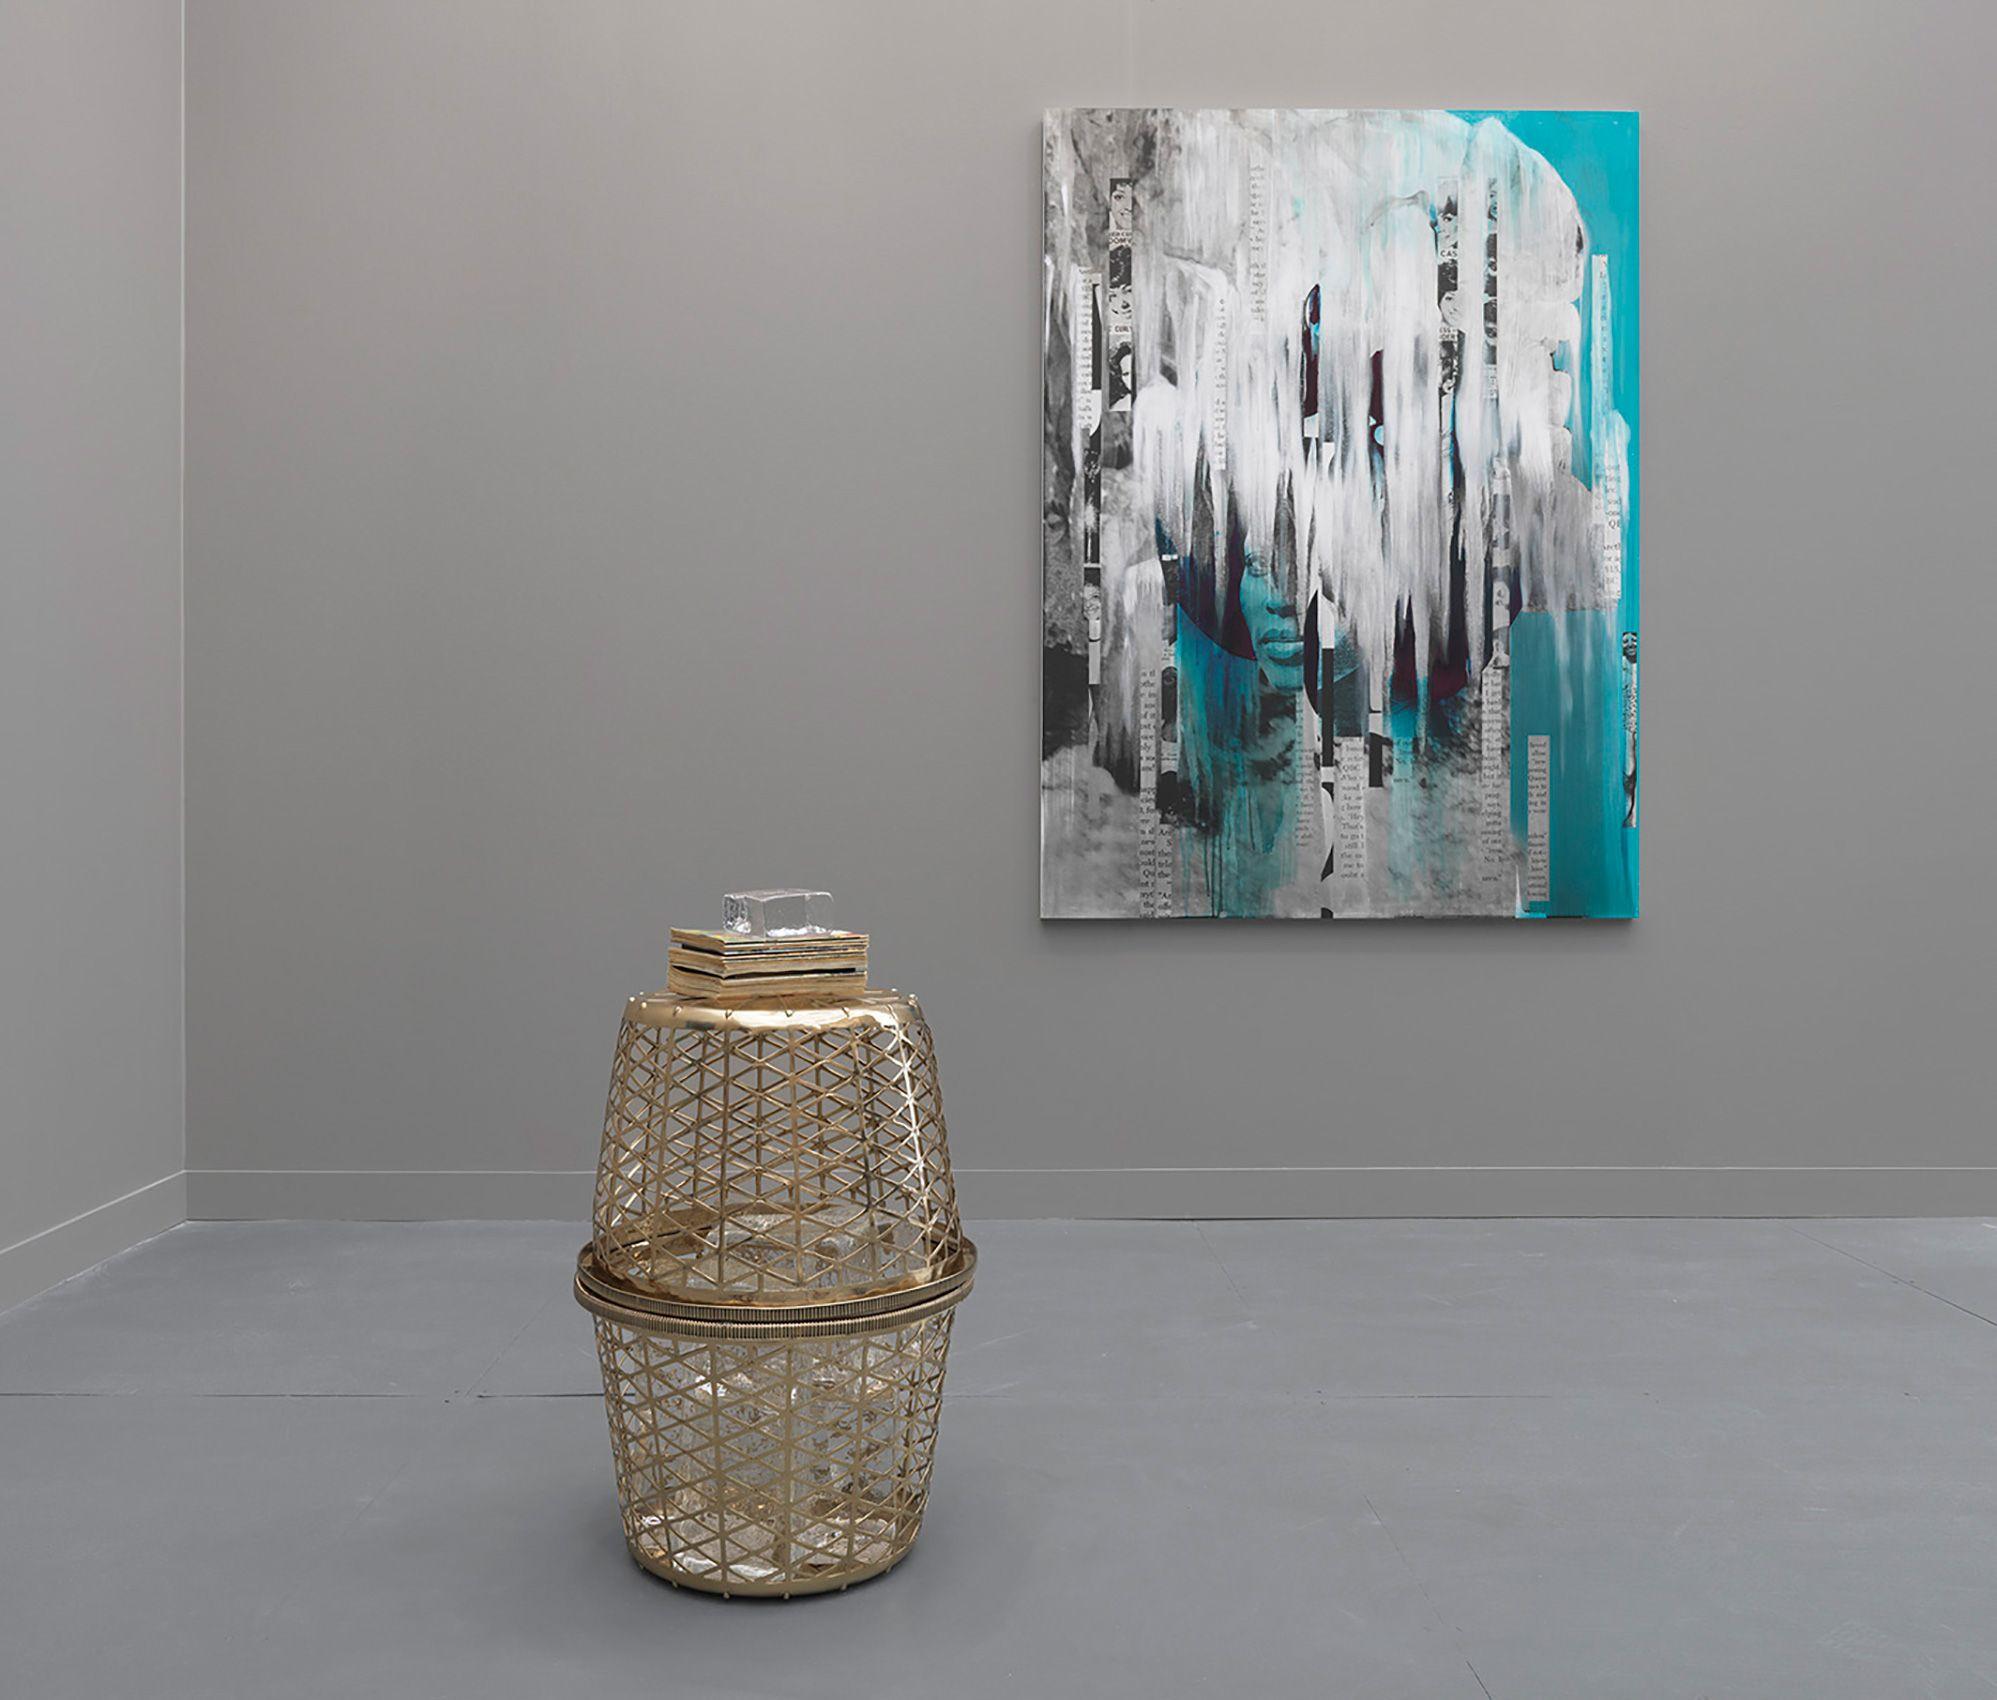 Lorna Simpson: Black & Ice, Hauser & Wirth, Frieze New York, NY 2017